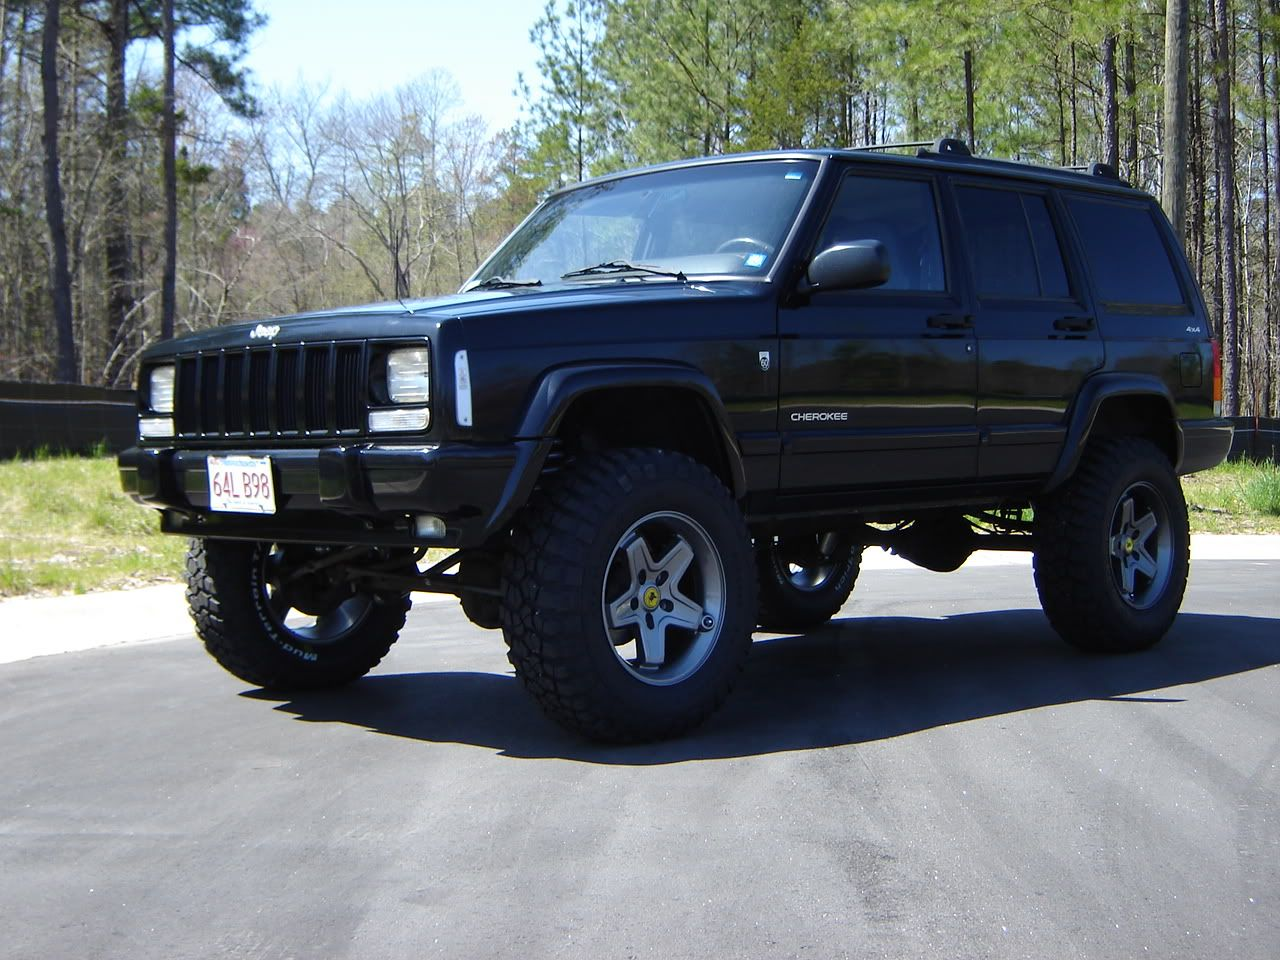 Jeep Cherokee 2001 jeep cherokee, Jeep cherokee, Jeep xj